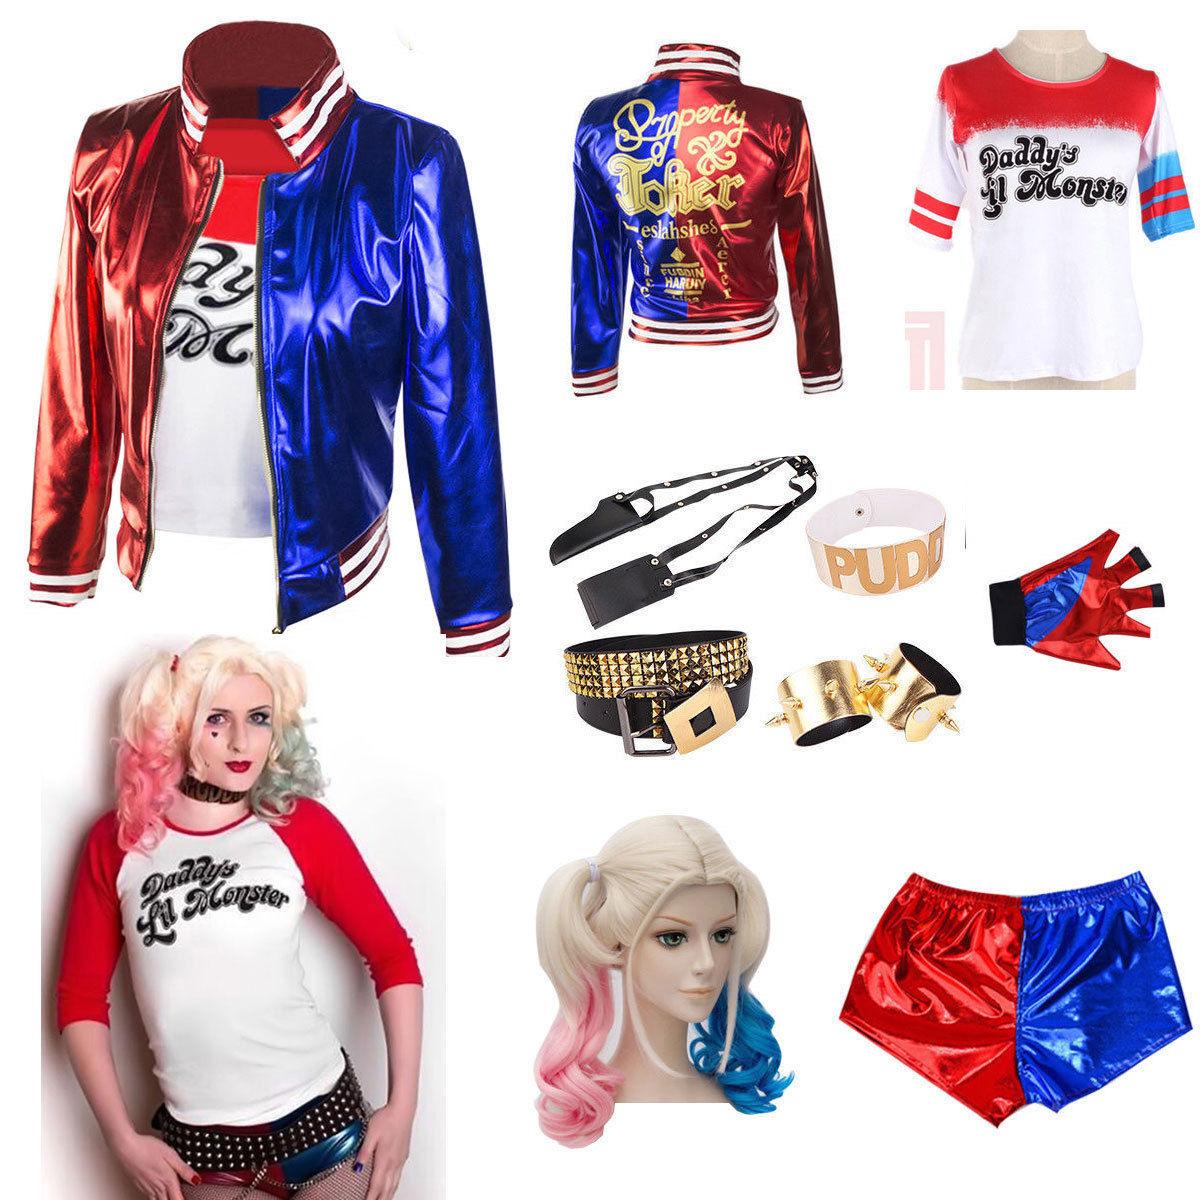 Halloween Costume Masquerade Comic-Con Fancy Ball T-shirt Tops Coat Jacket Belt